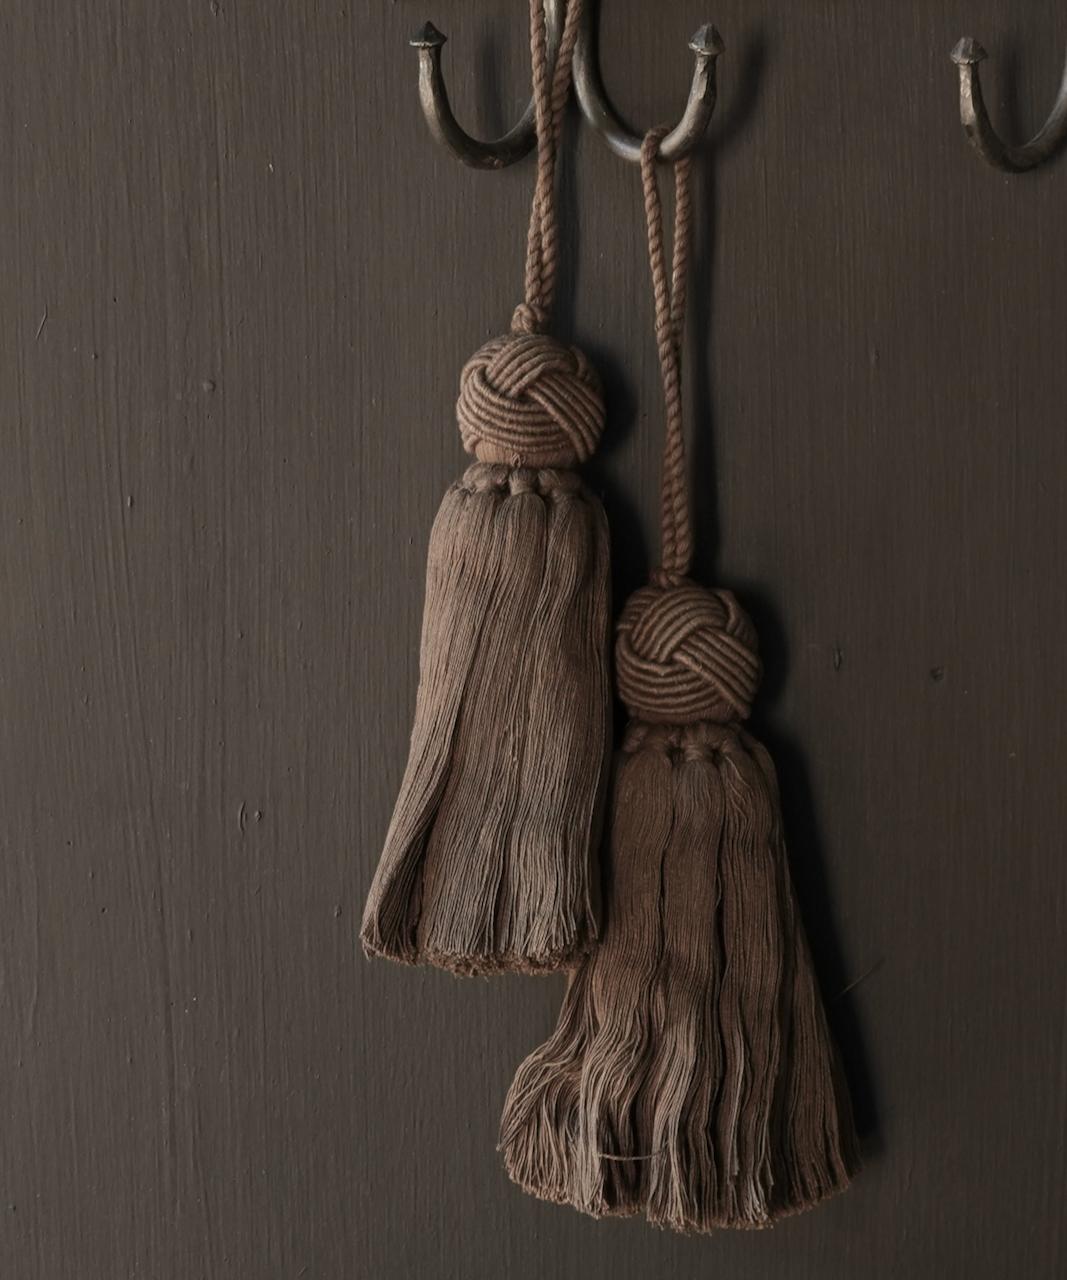 Cotton tassel, brush or tuft-1